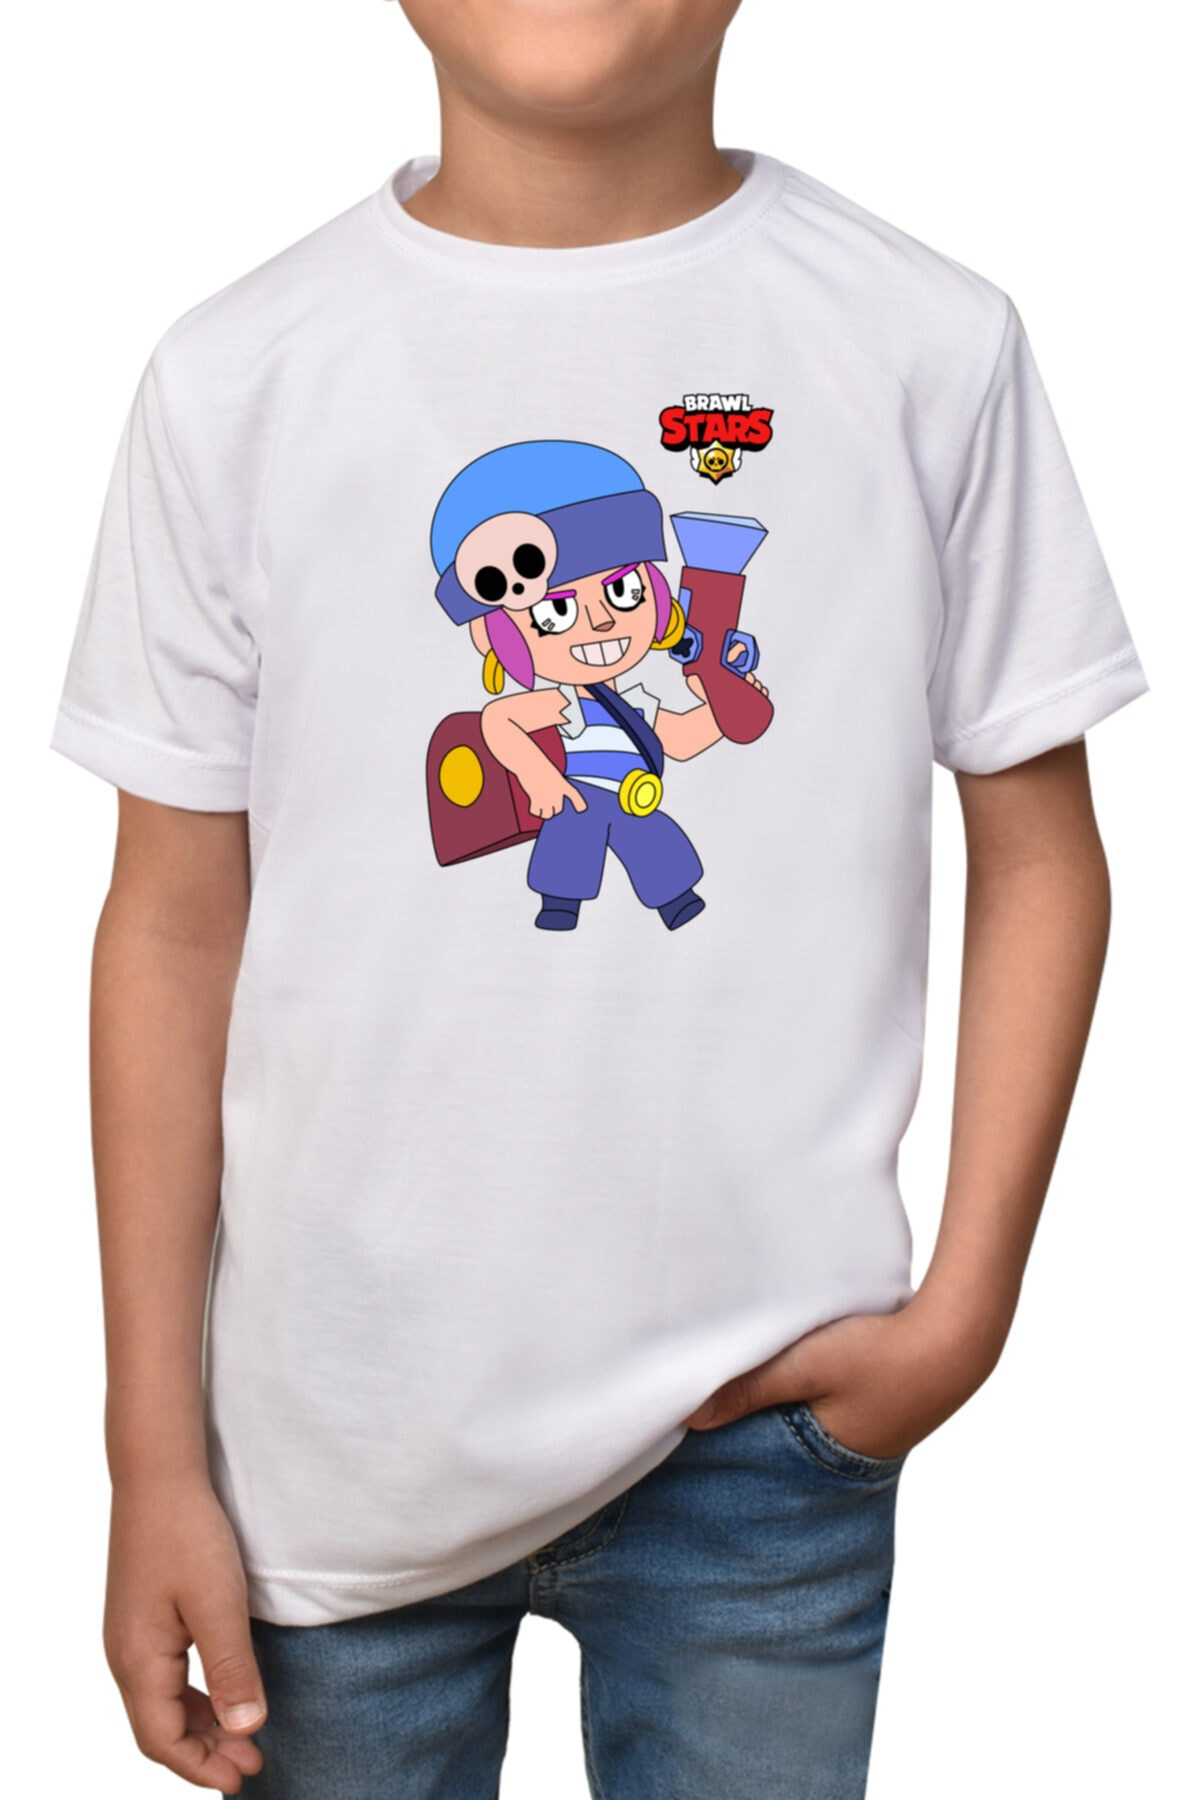 Brawl Stars - Penny-t-1- Beyaz Çocuk - Yetişkin Unisex T-shirt T-2